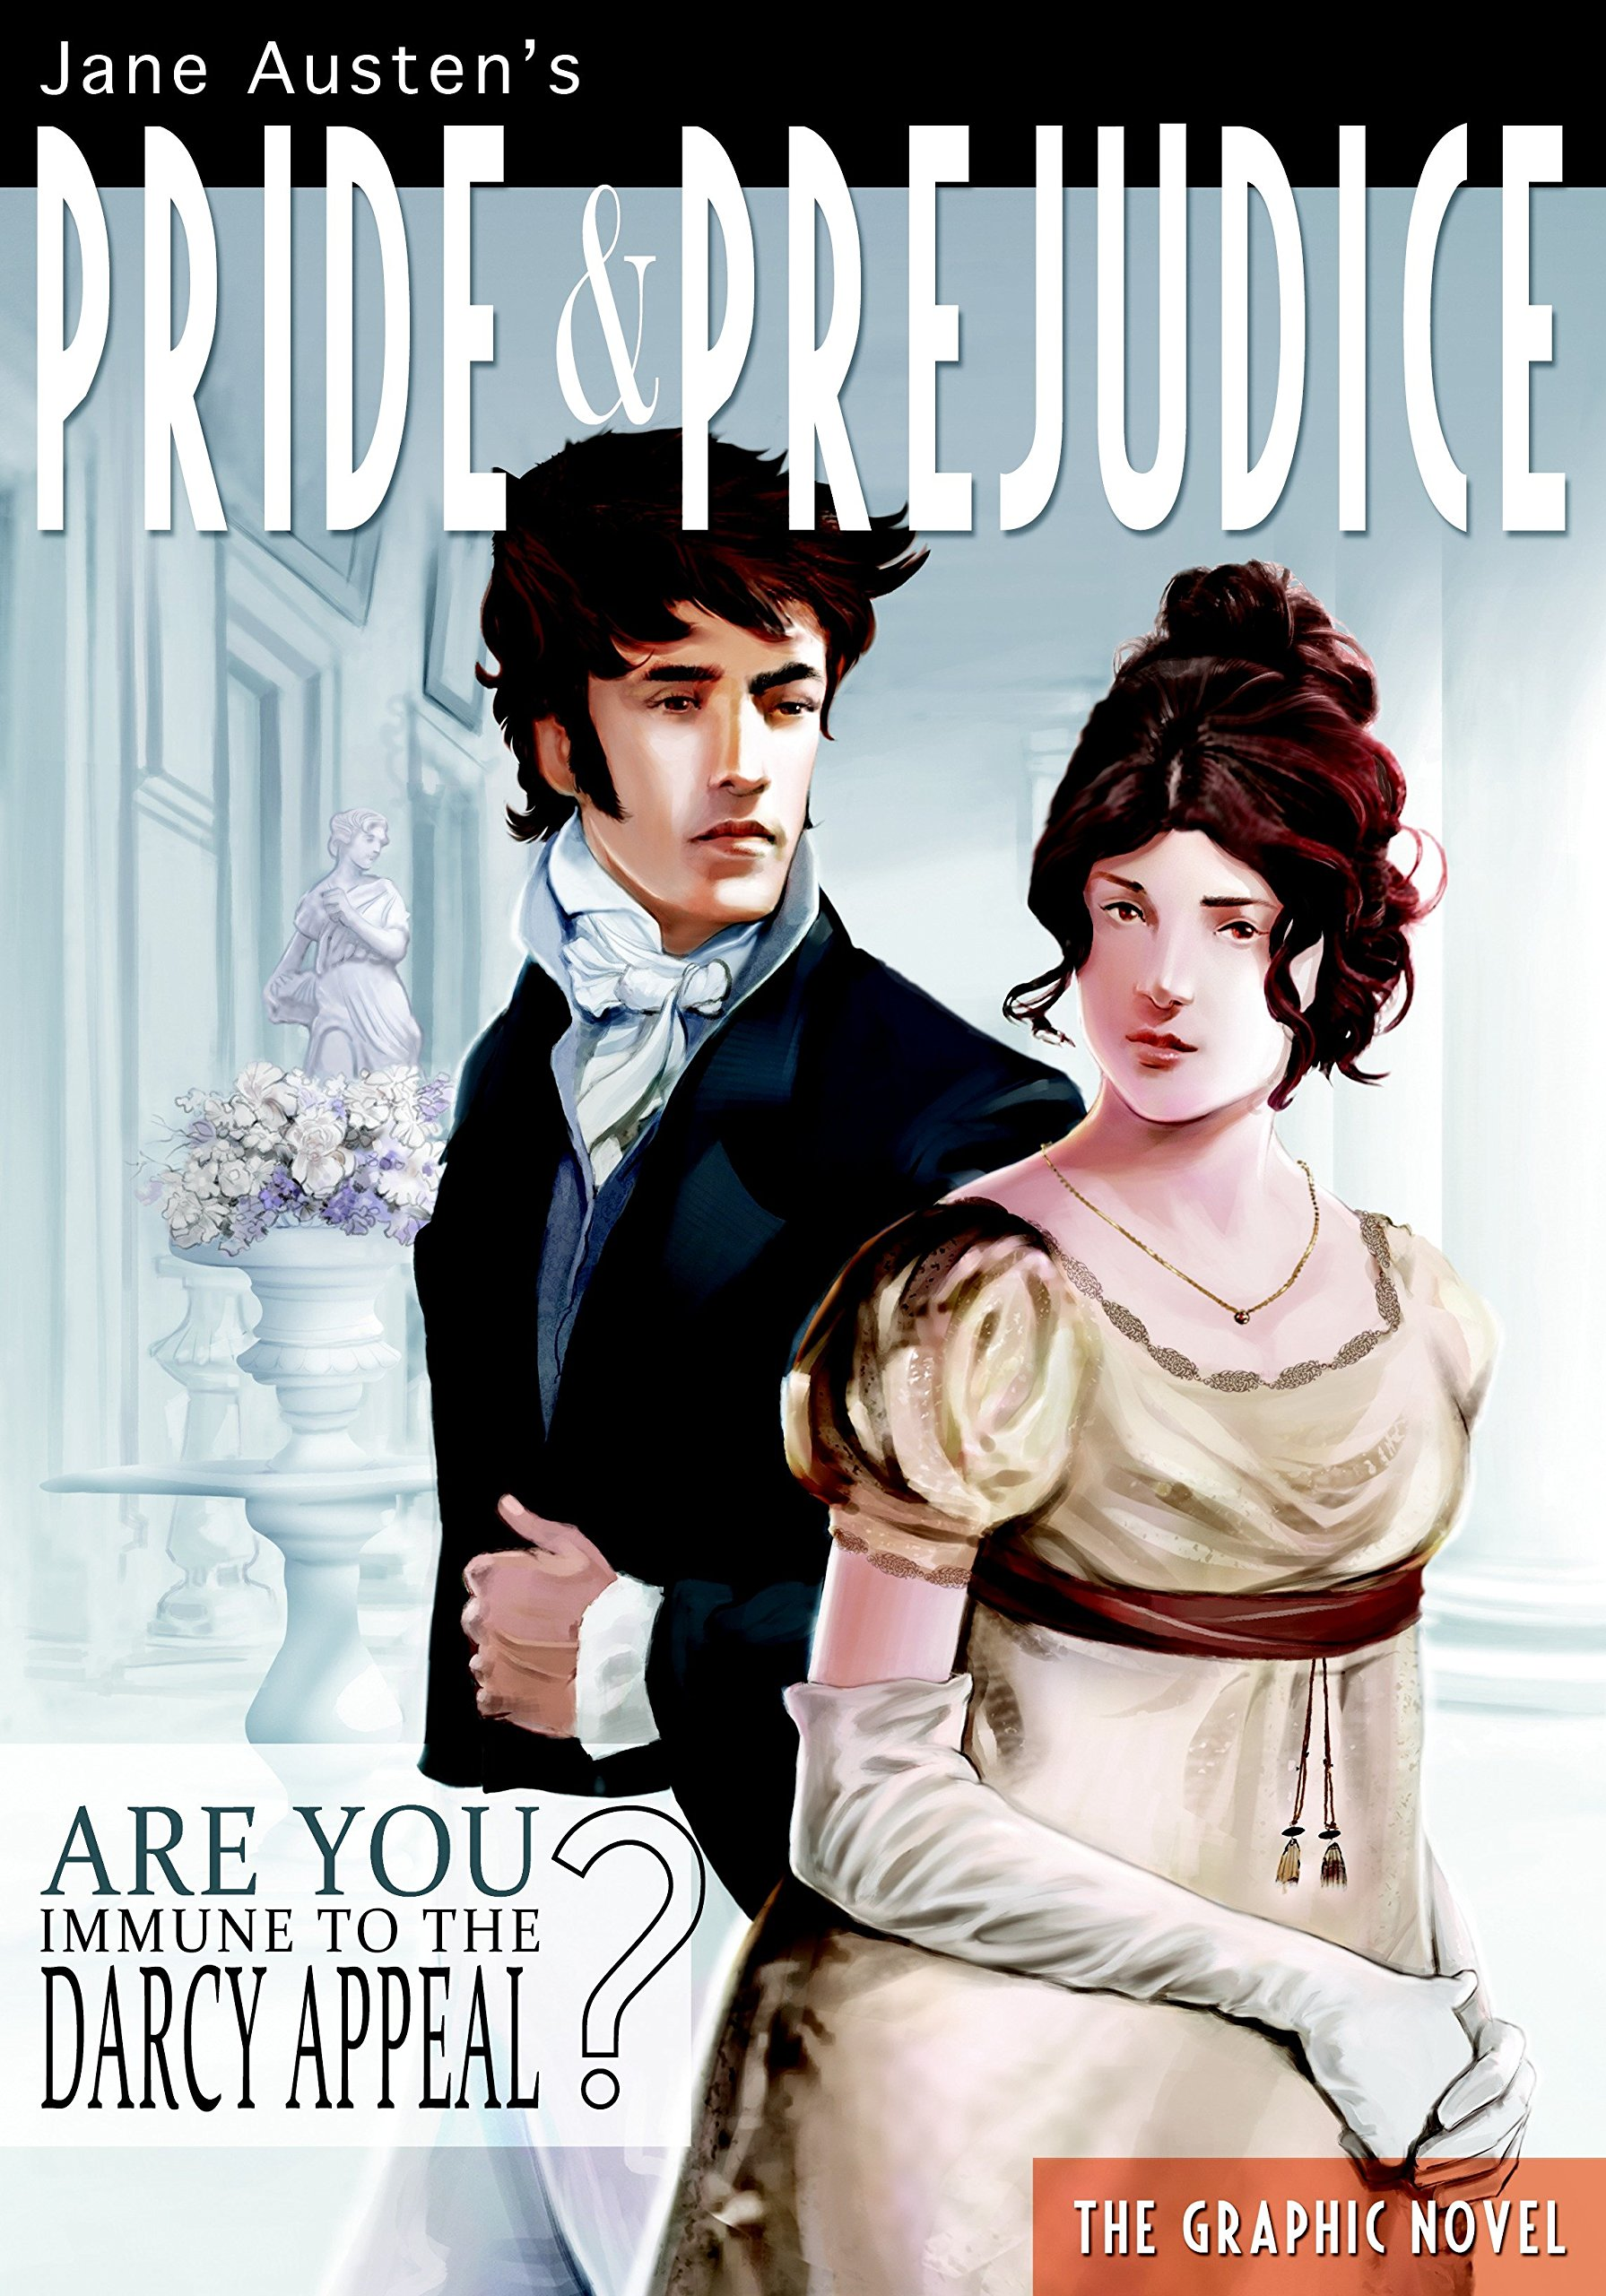 Pride and Prejudice: The Graphic Novel (Campfire Graphic Novels)